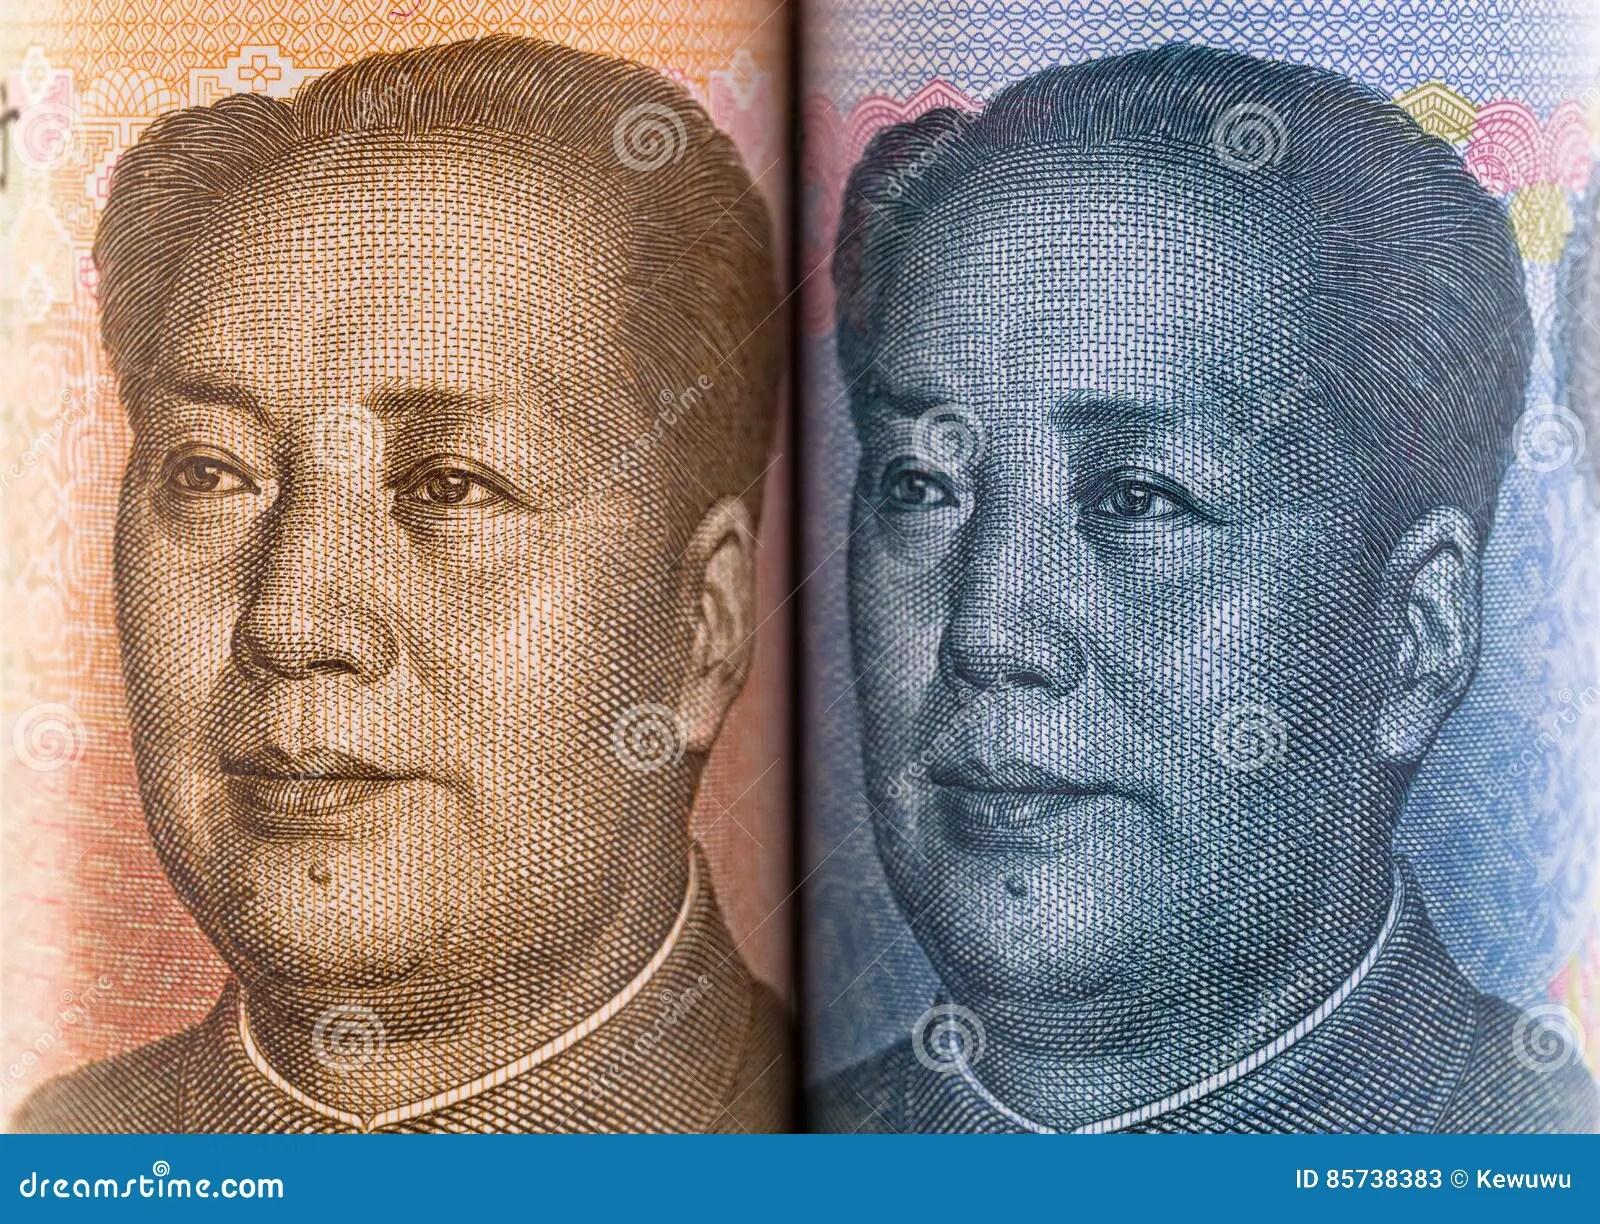 Facial Part Of Chinese Yuan Banknotes With Face Of Mao Tse